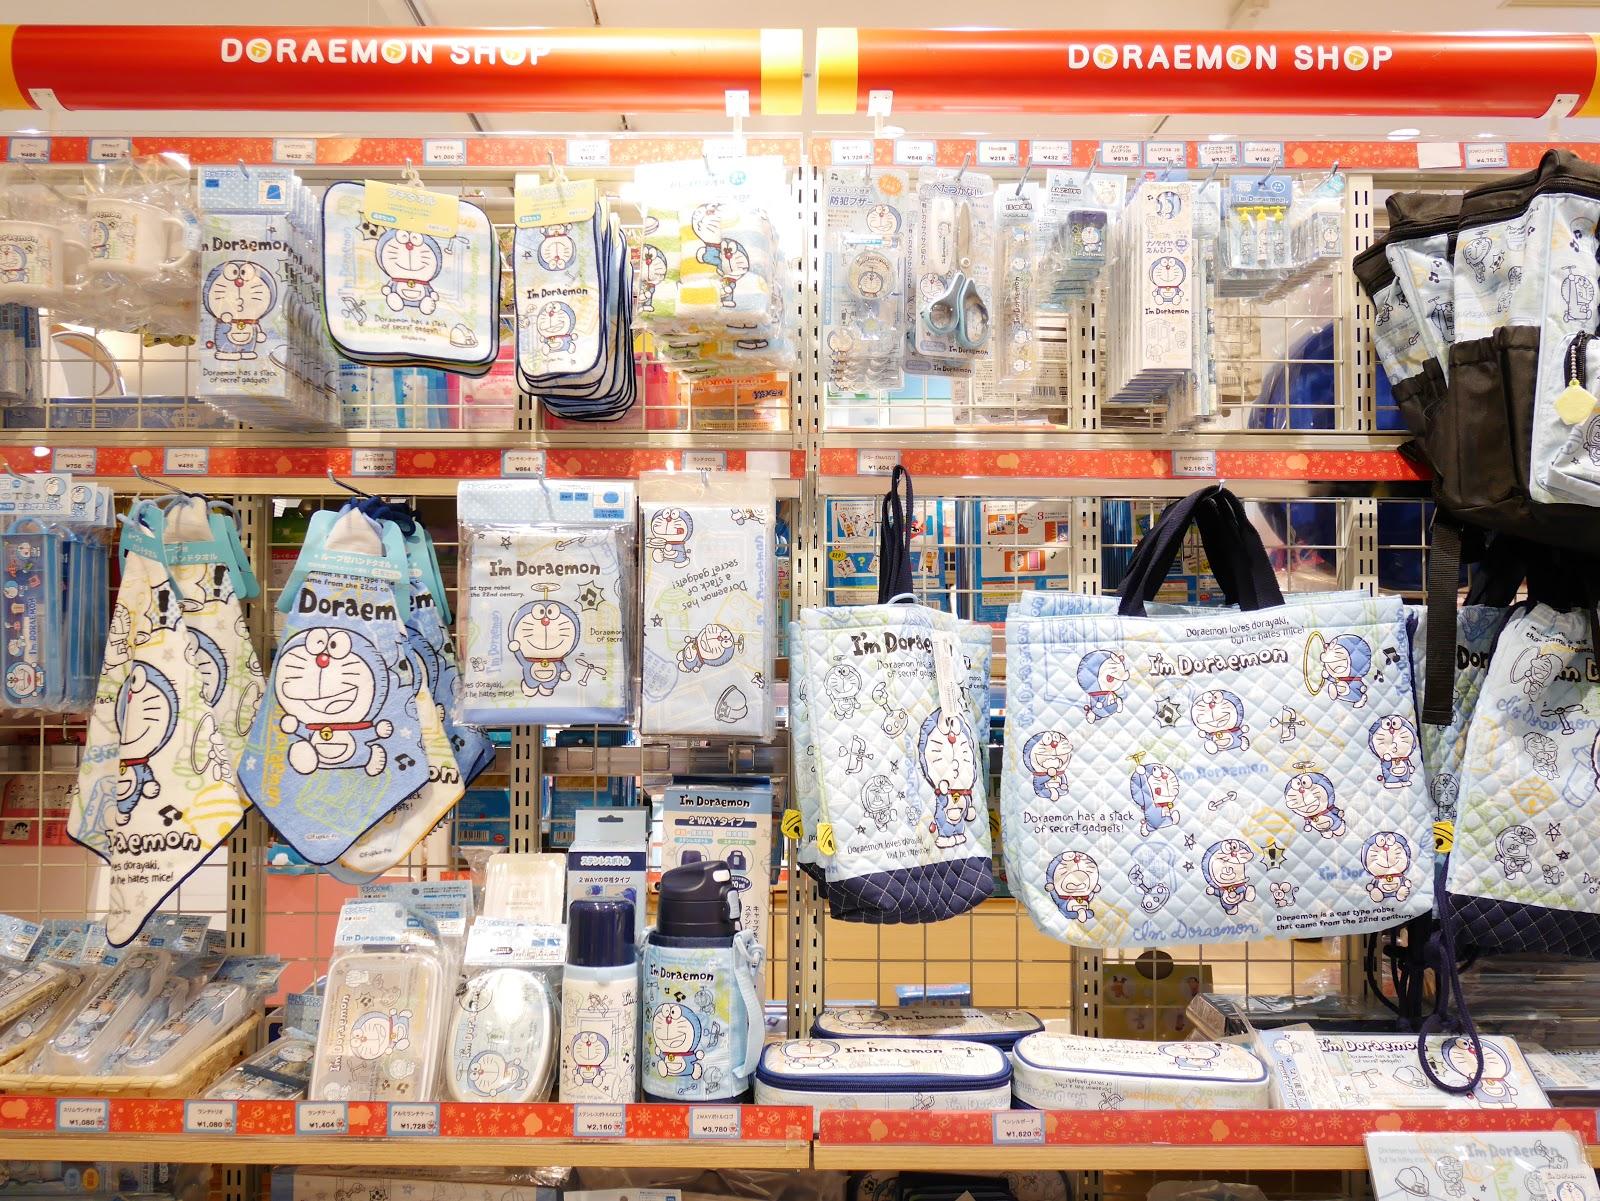 Entry Bergambar Hokkaido Day 1 Media Panas Tcash Vaganza 39 Bantal Mobil 3 In Mini Mouse Aksesoris Semua Barang Doraemon Je Dah Nama Skypark Kan Kedai Cenderahati All La Takkan Upin Ipin Pulek Keke